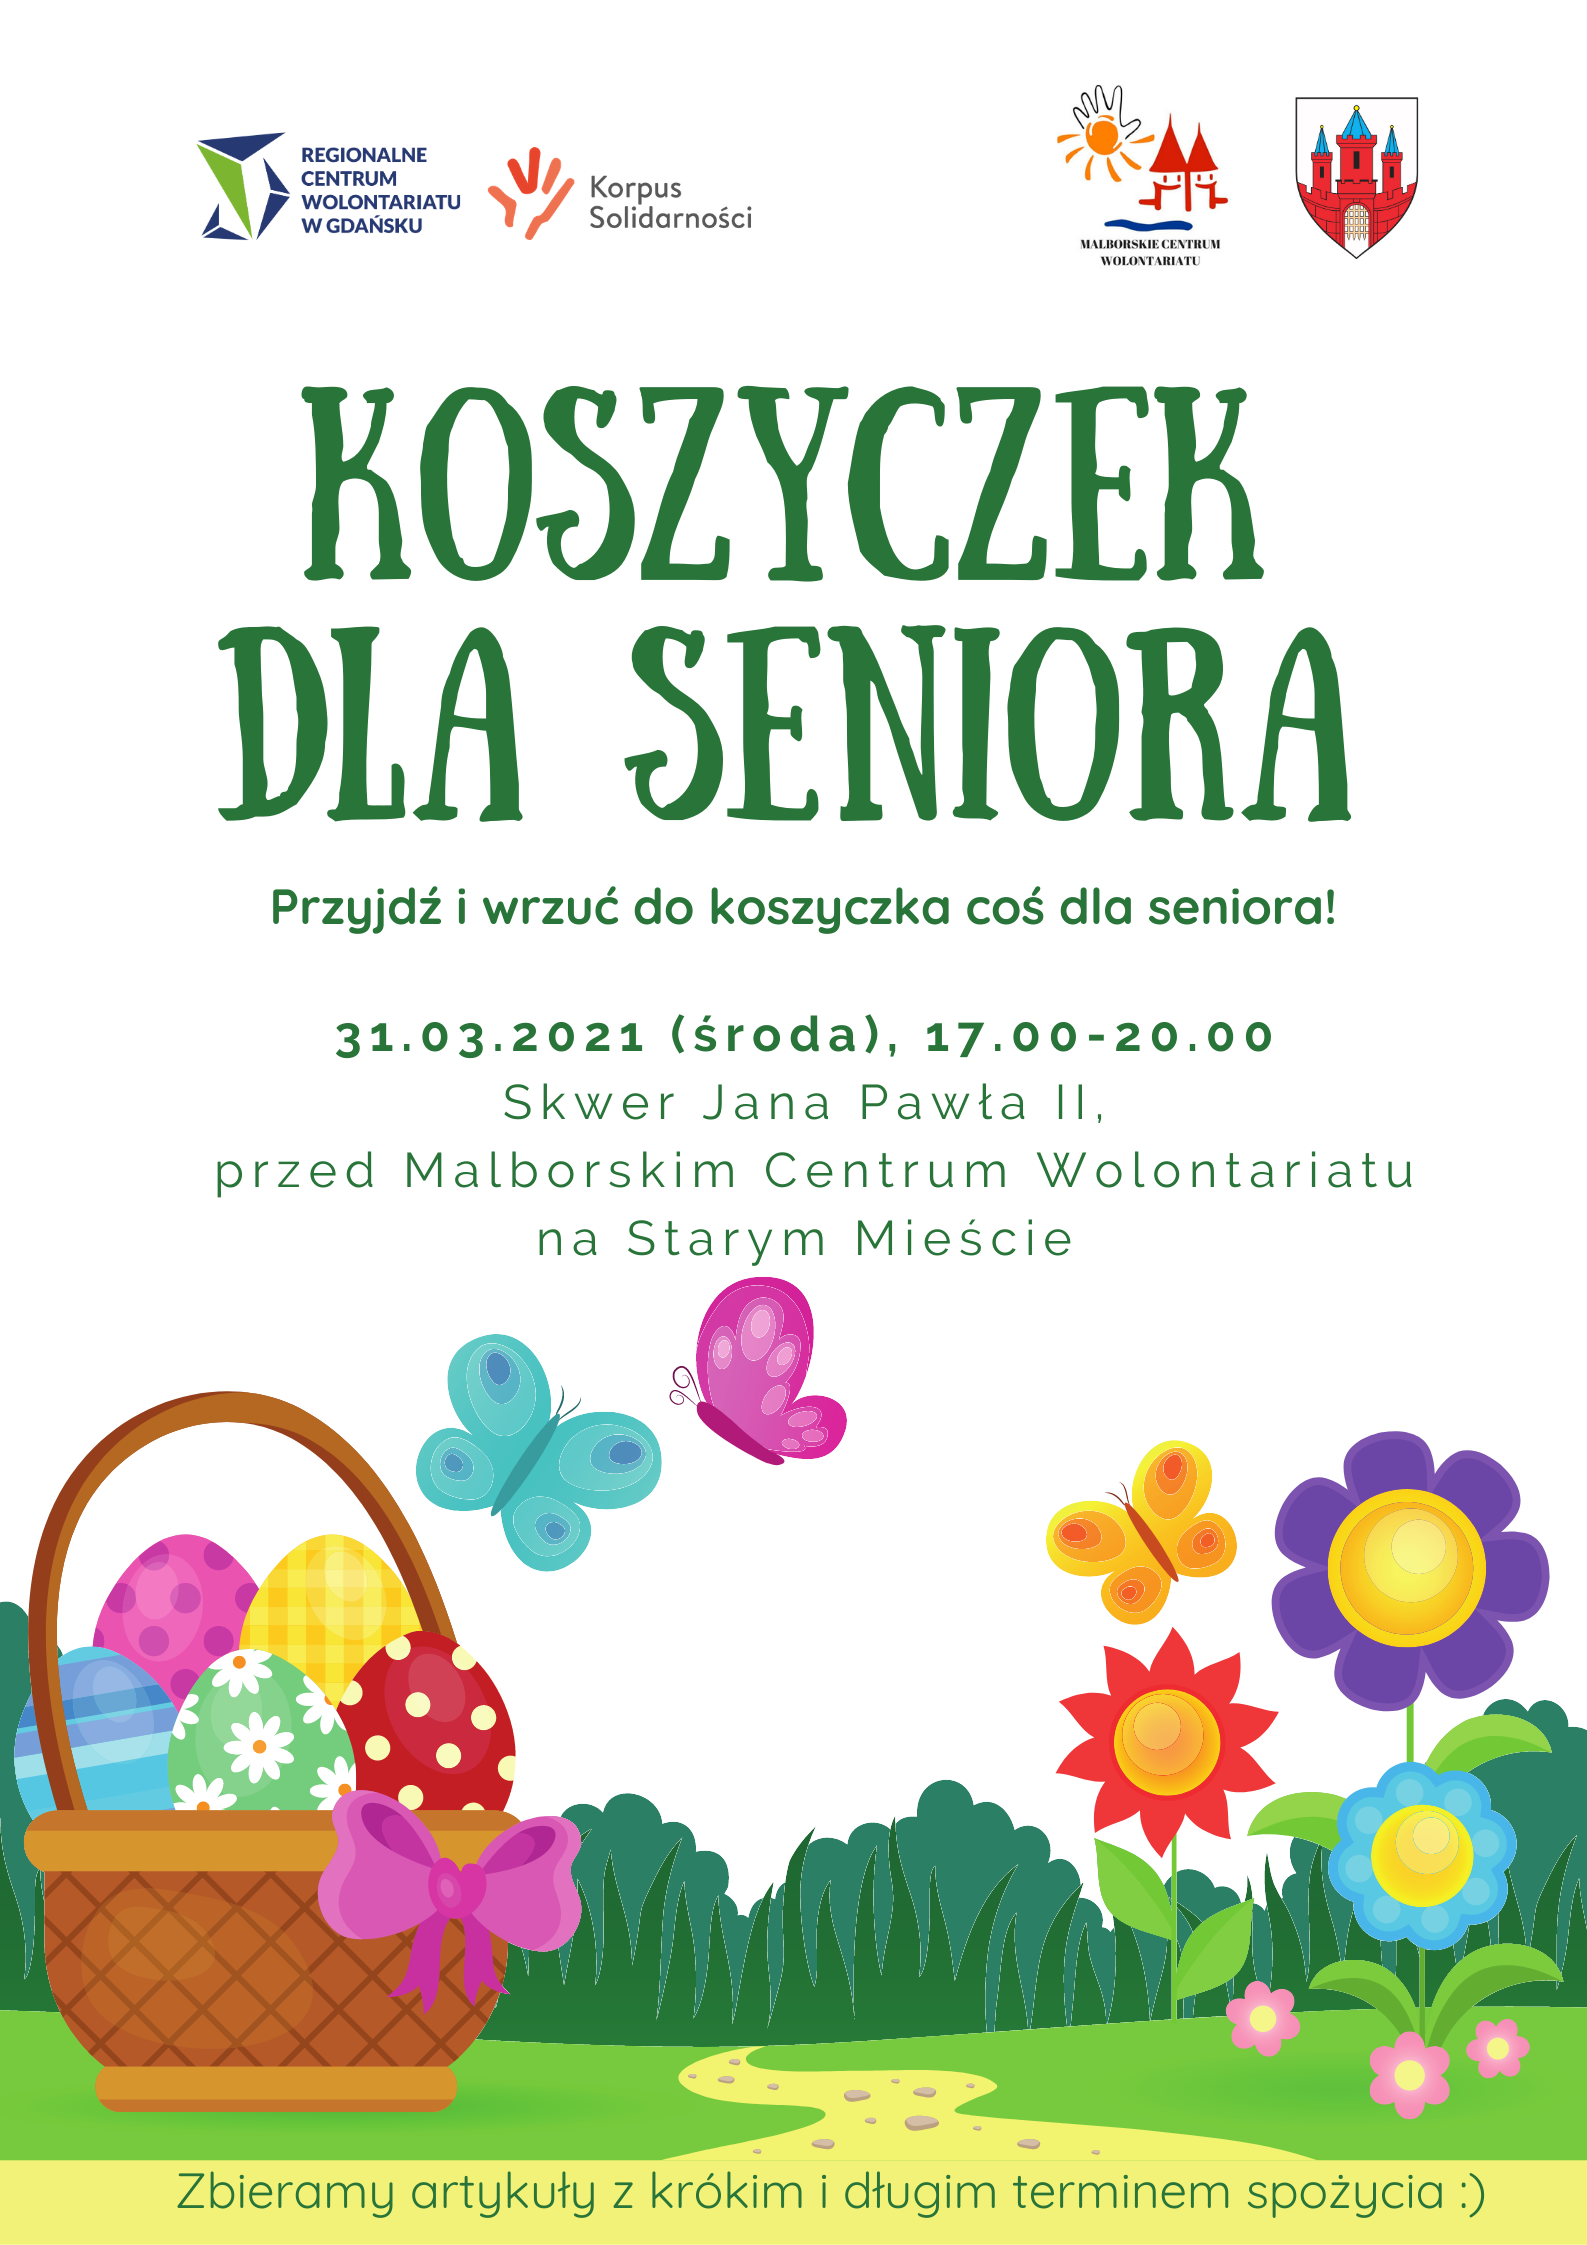 http://m.82-200.pl/2021/03/orig/koszyczek-dla-seniora-malbork-1-1-1-6927.png